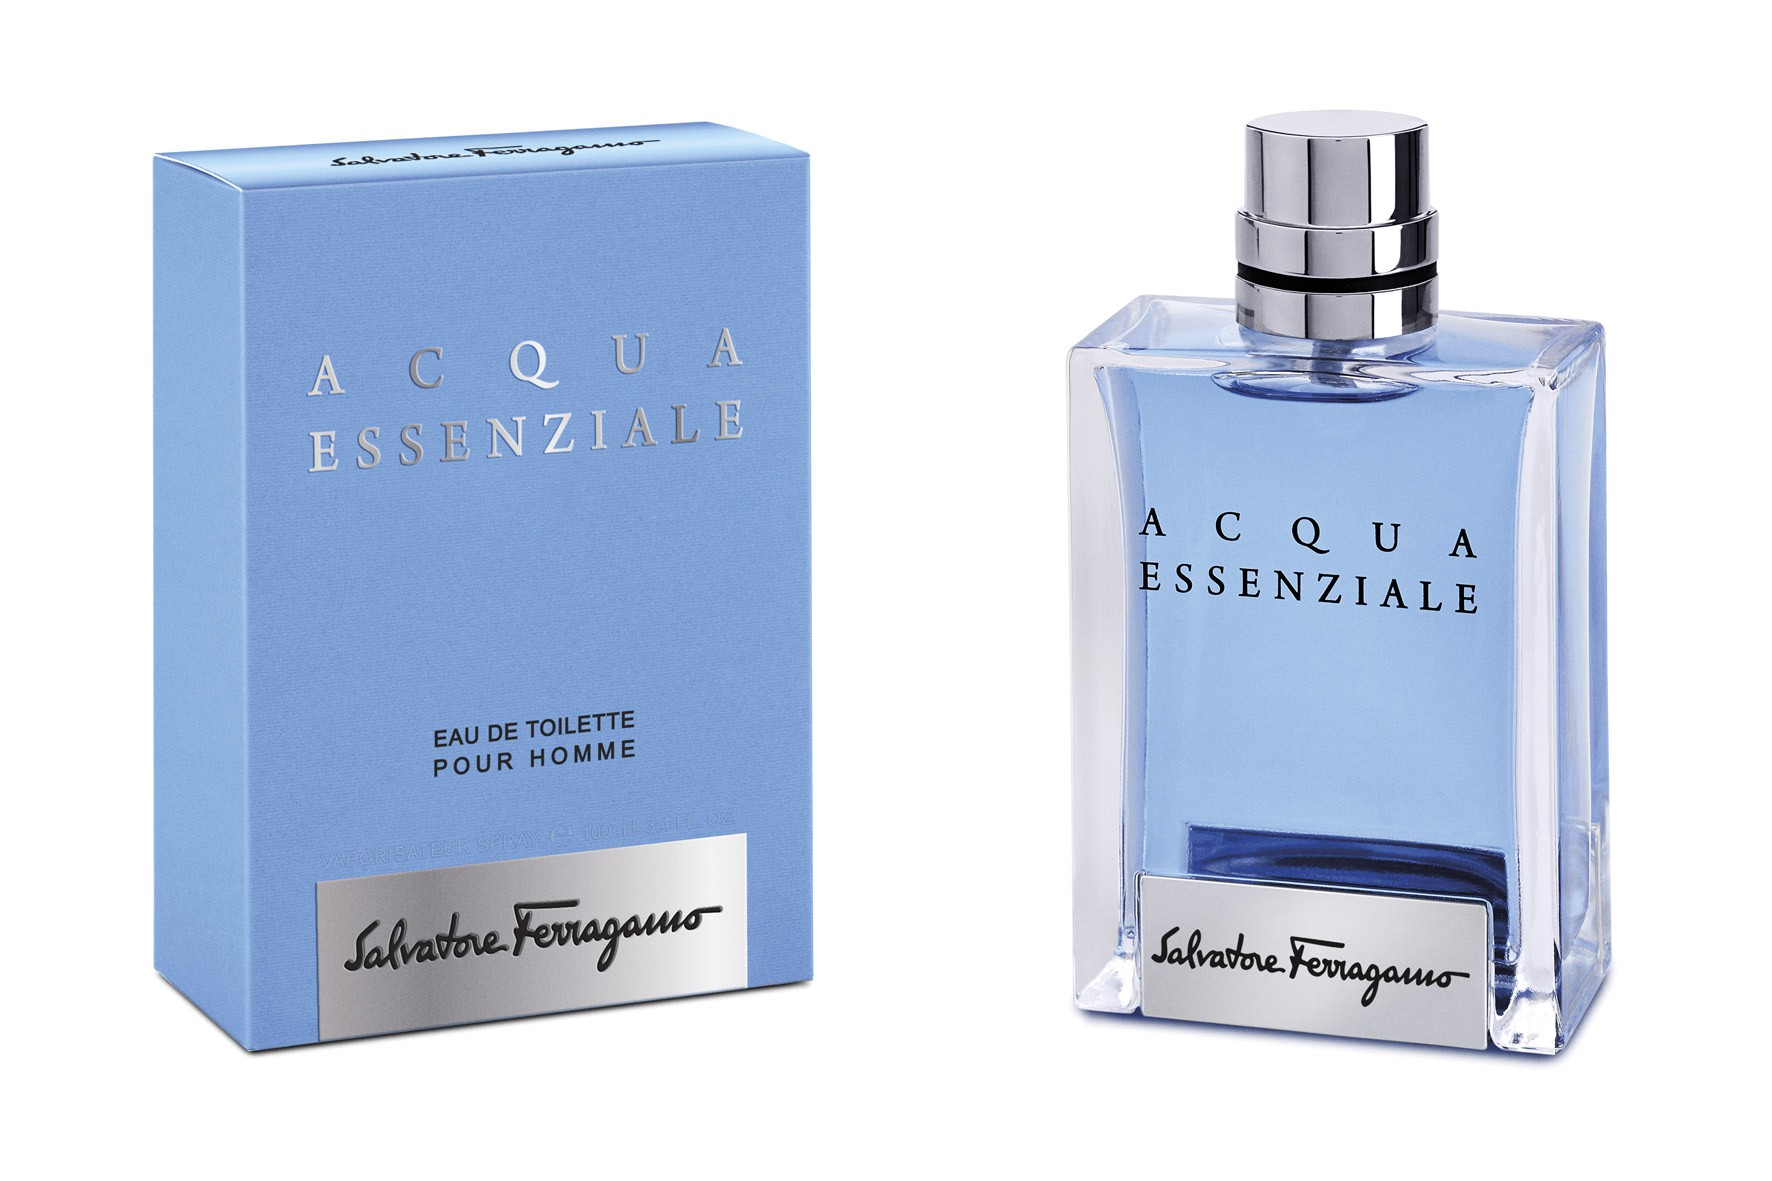 Salvatore Ferragamo Acqua Essenziale аромат для мужчин